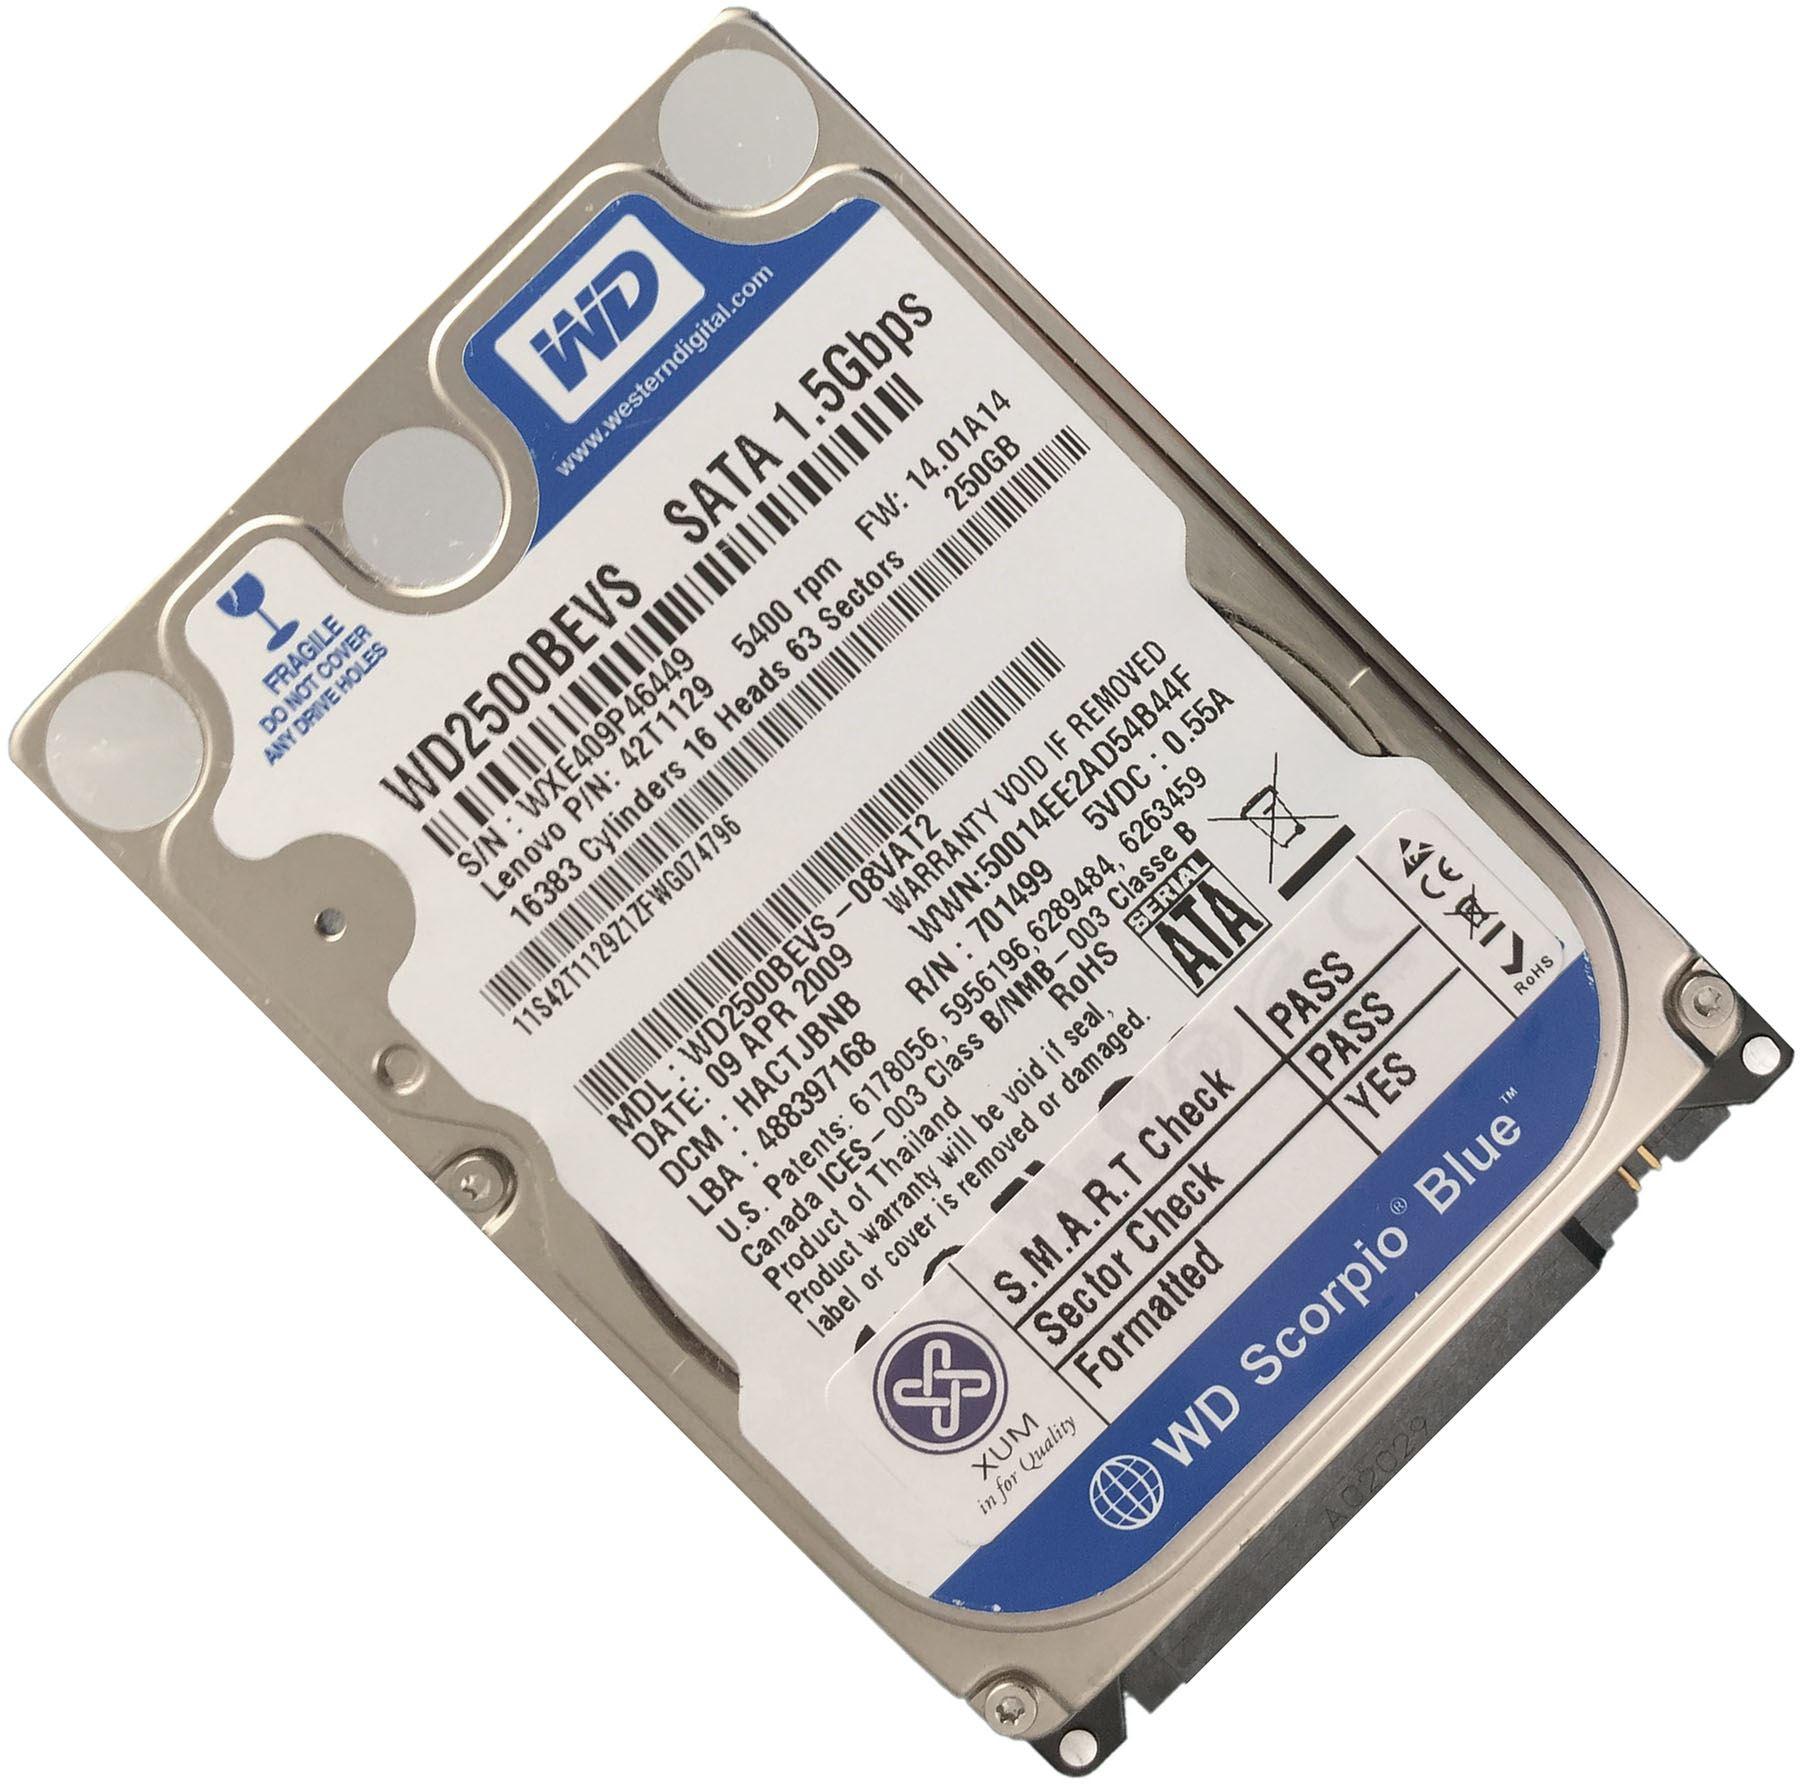 25 5400RPM SATA I 15Gbs 8MB Cache Internal Hard Drive